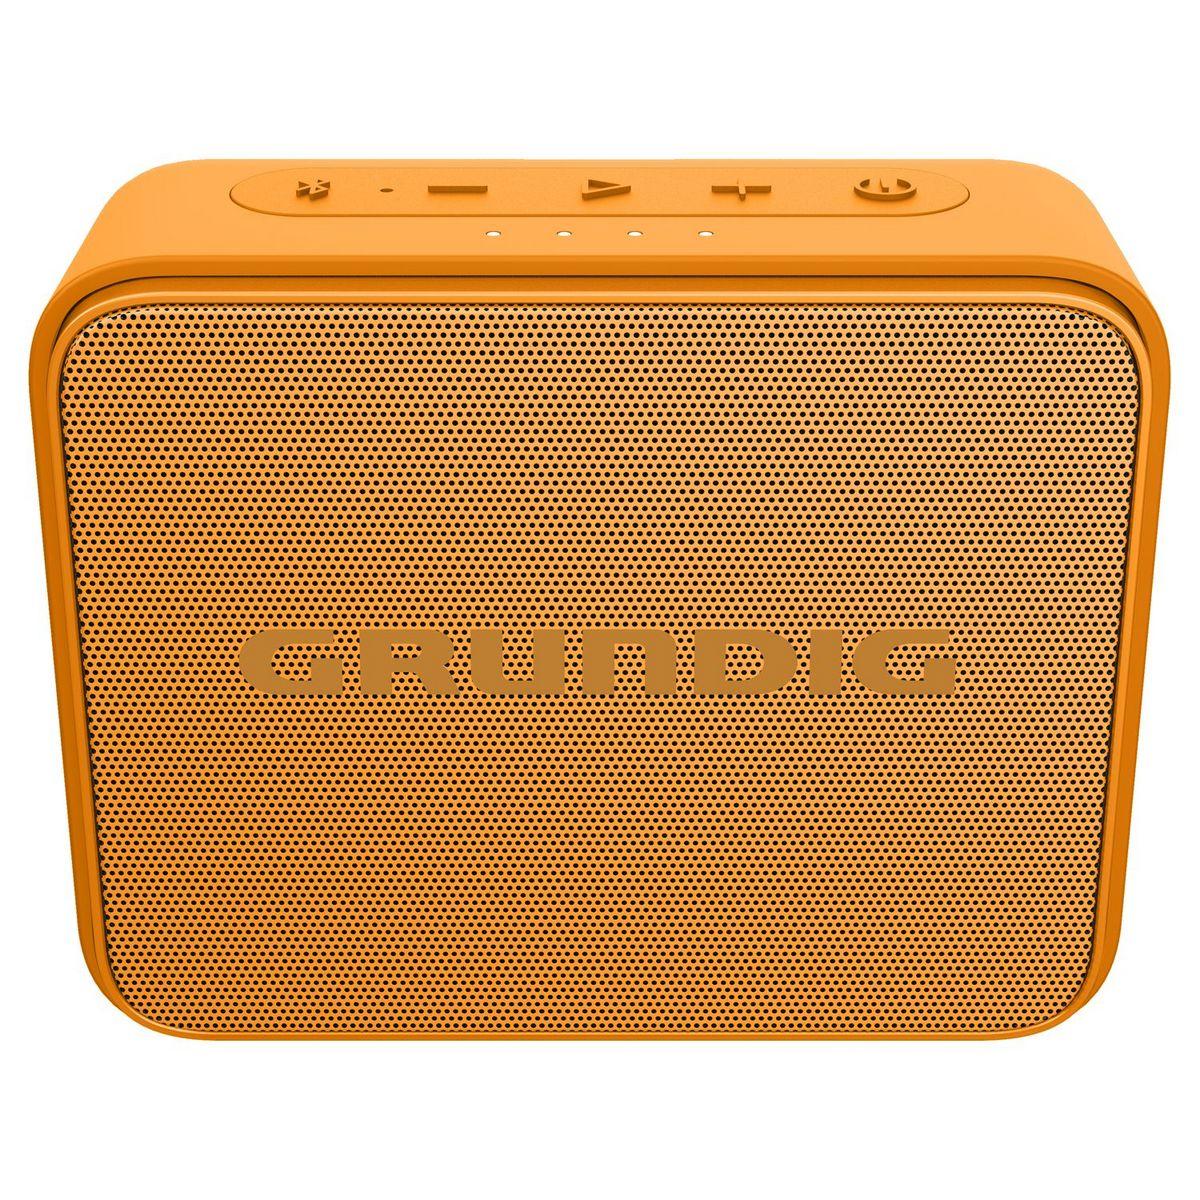 Enceinte portable Bluetooth - JAM - Orange